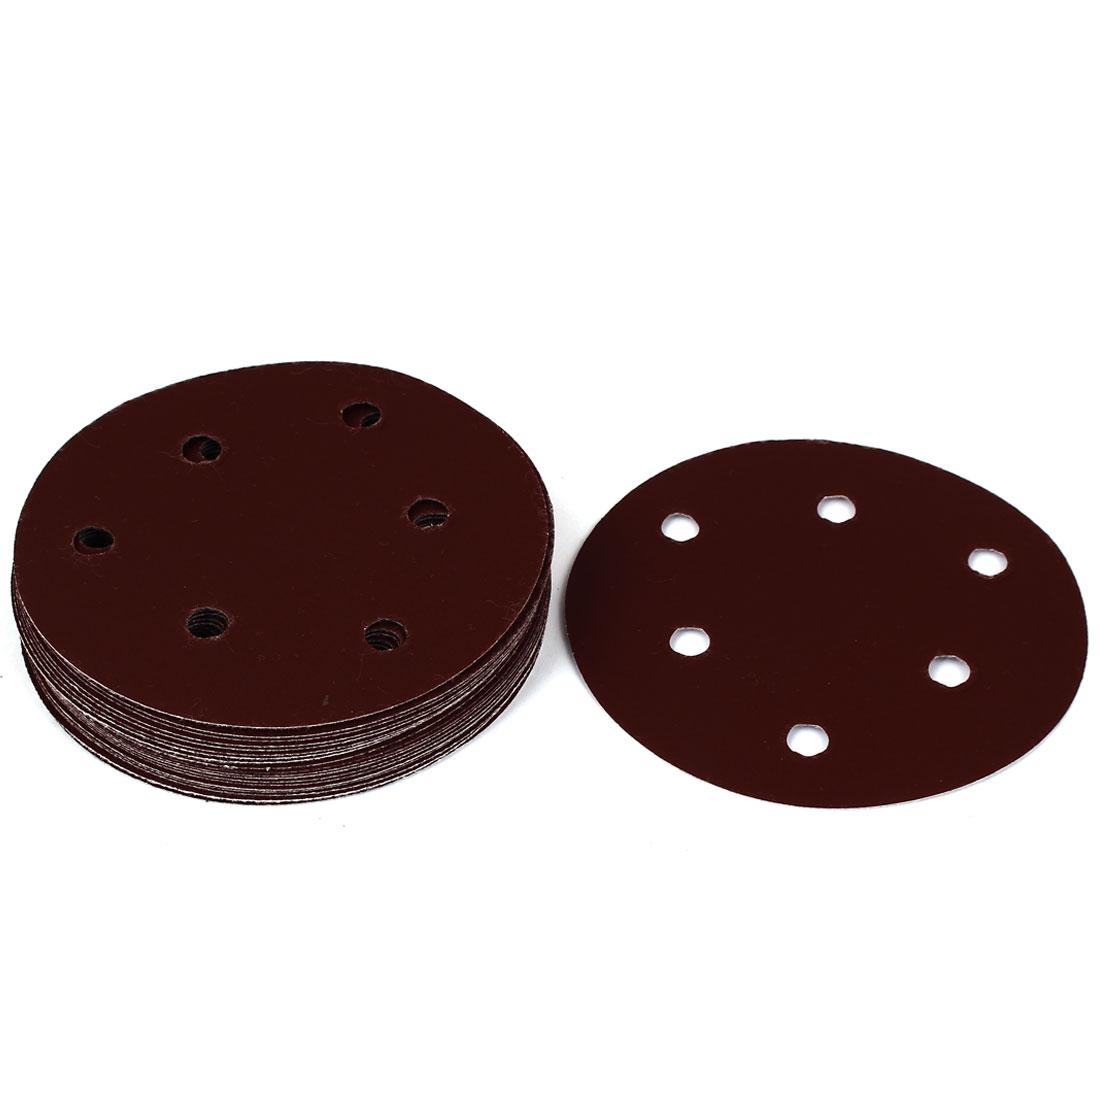 "5"" Dia 600 Grit 6 Holes Sanding Paper Disc Sandpaper 20pcs for Oscillating Tool"